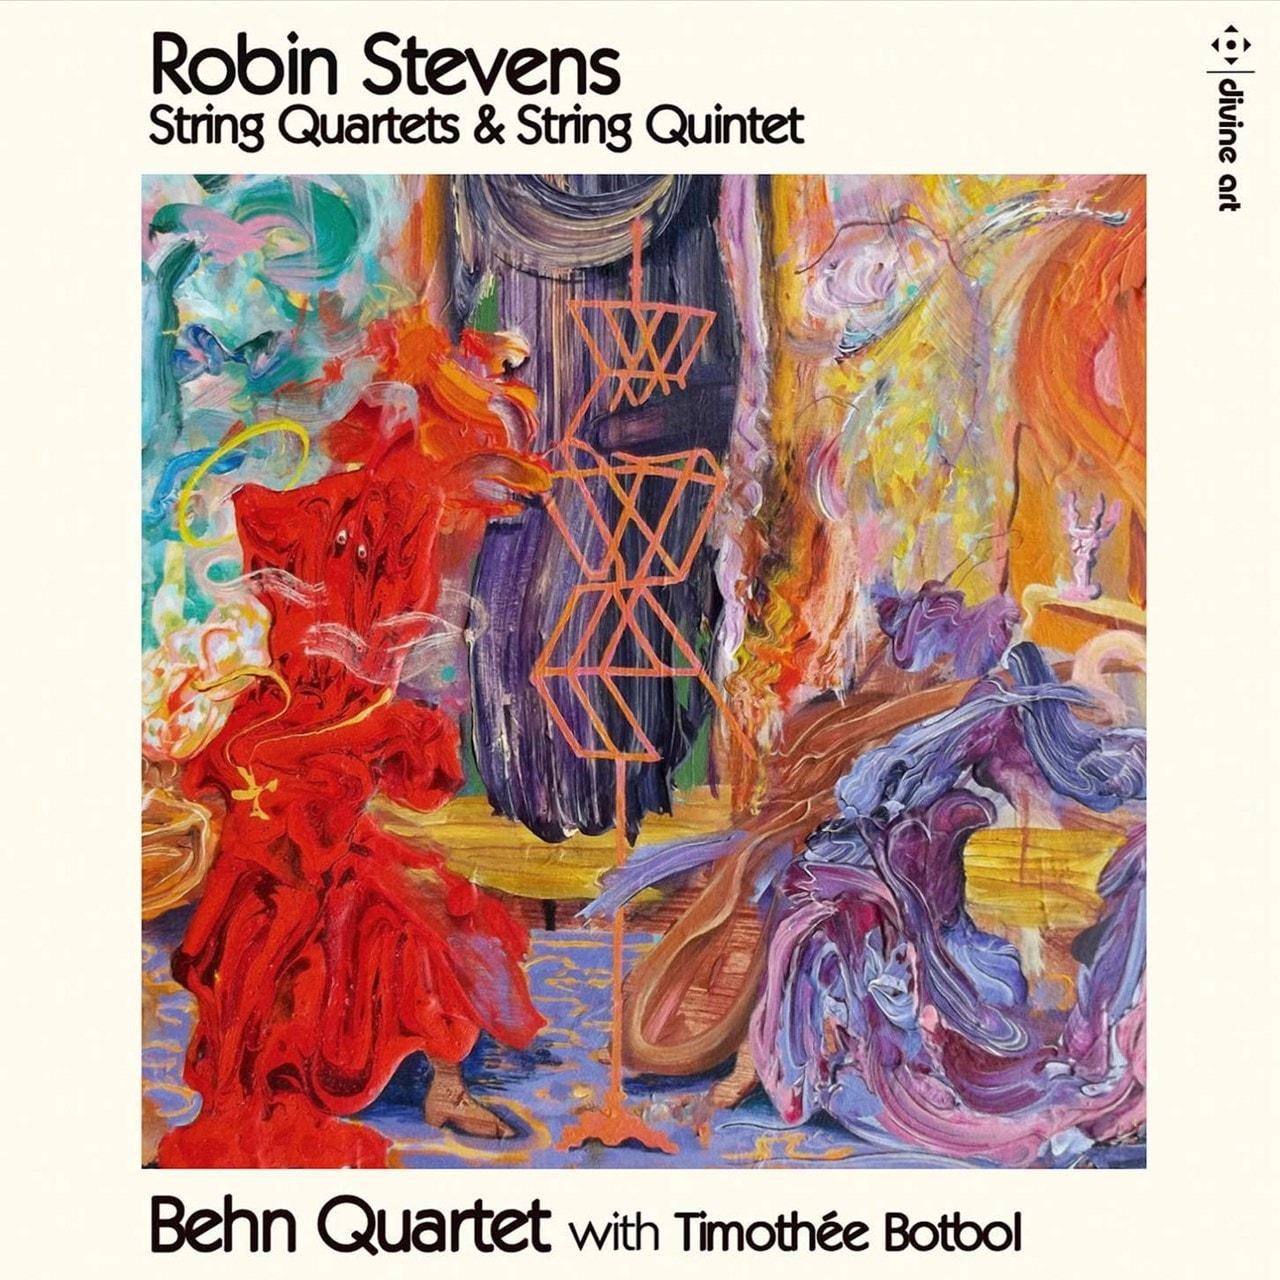 Robin Stevens: String Quartets & String Quintet - 1